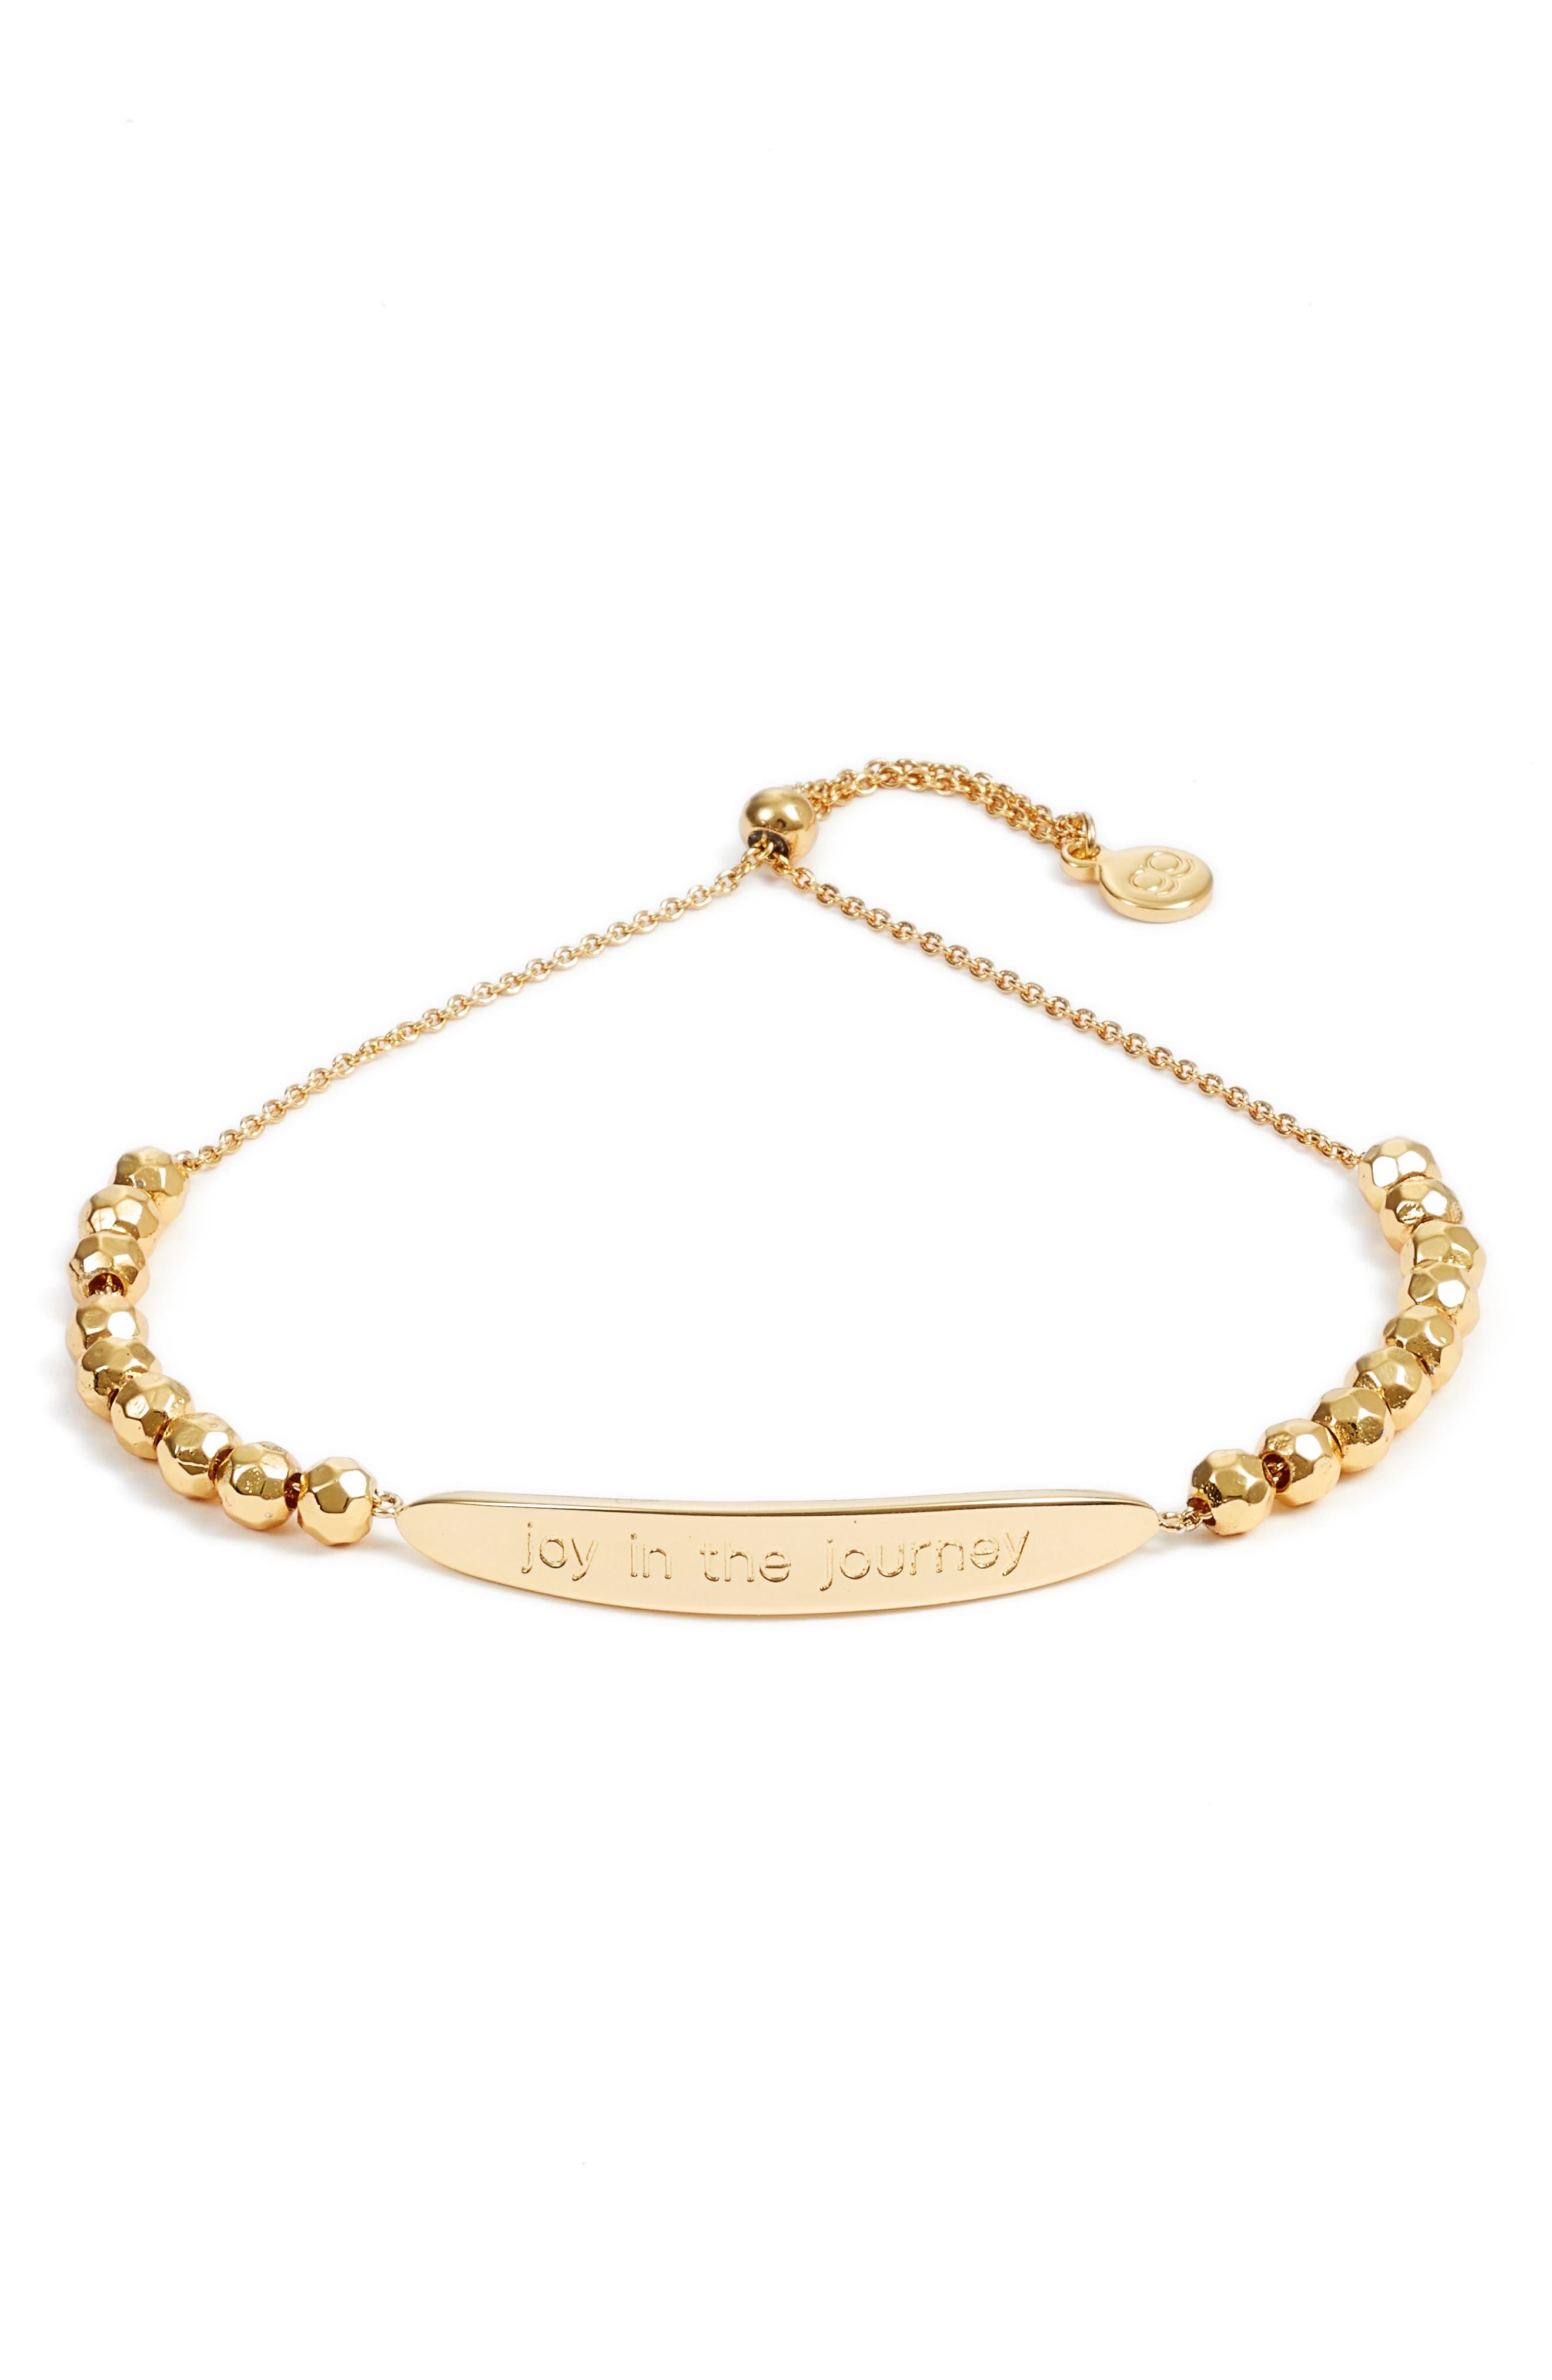 Power Intention Joy in the Journey Adjustable Bracelet,                         Main,                         color, Gold